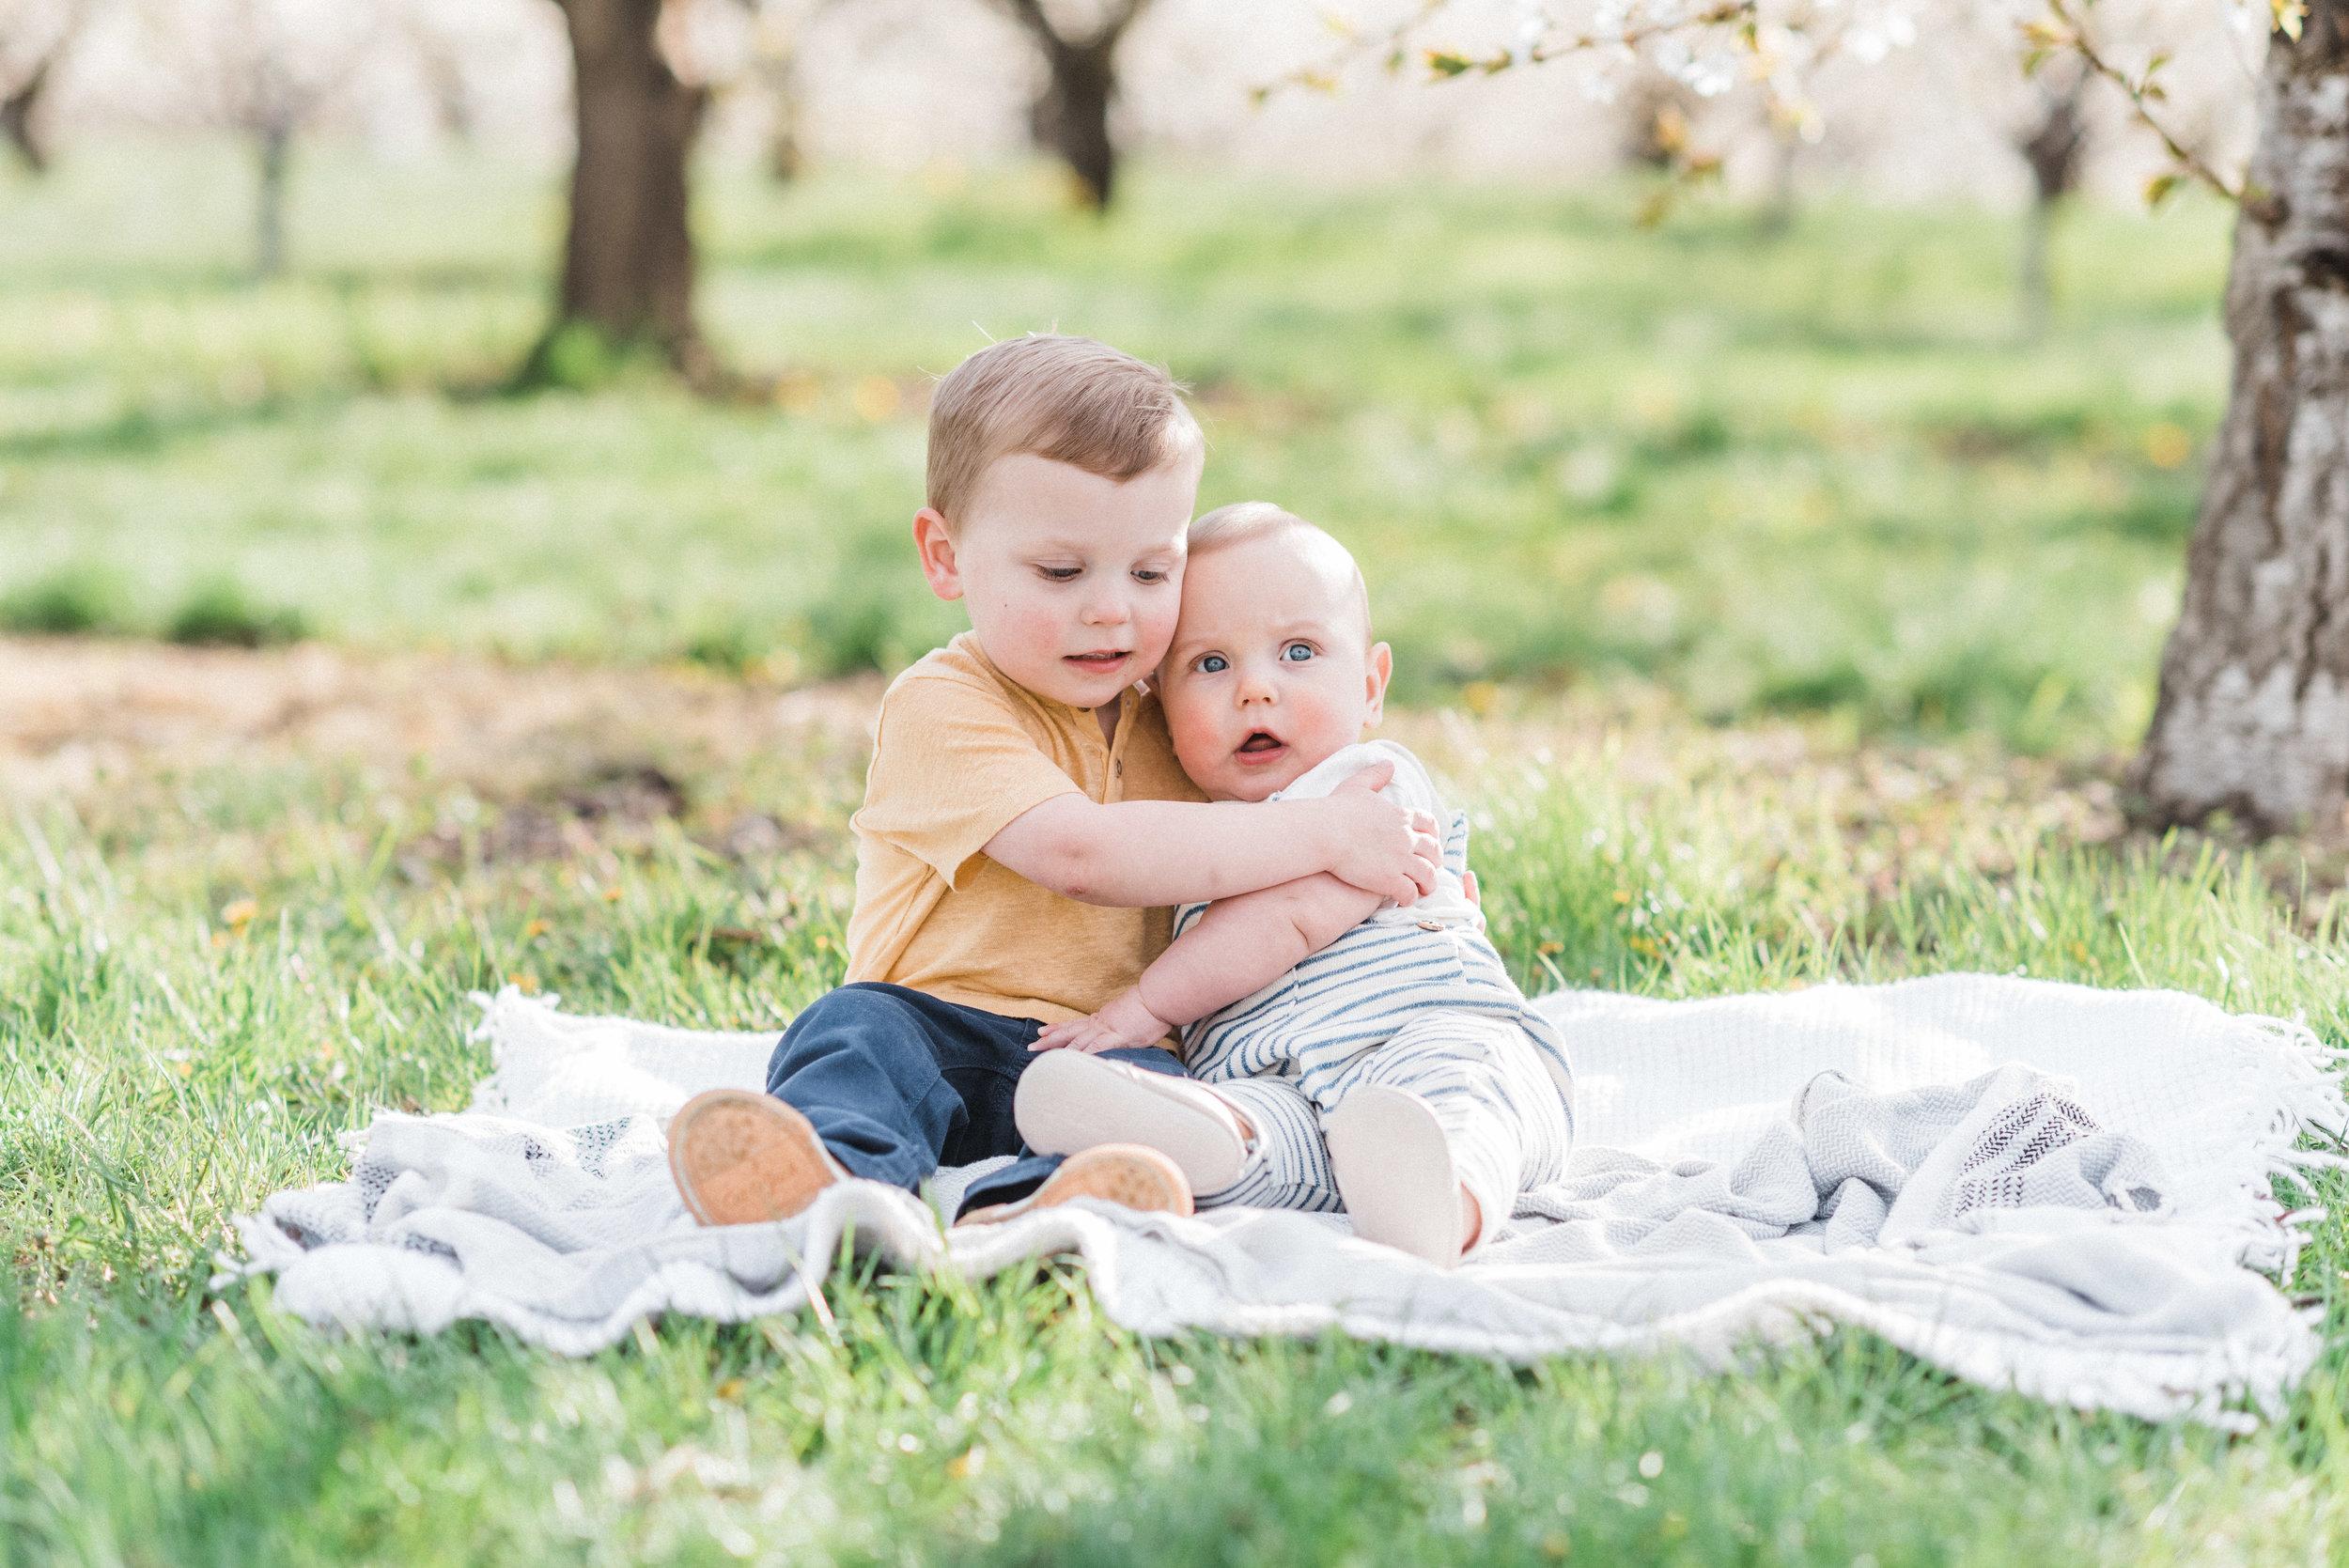 spokane_baby_session_orchard_spring-1.jpg